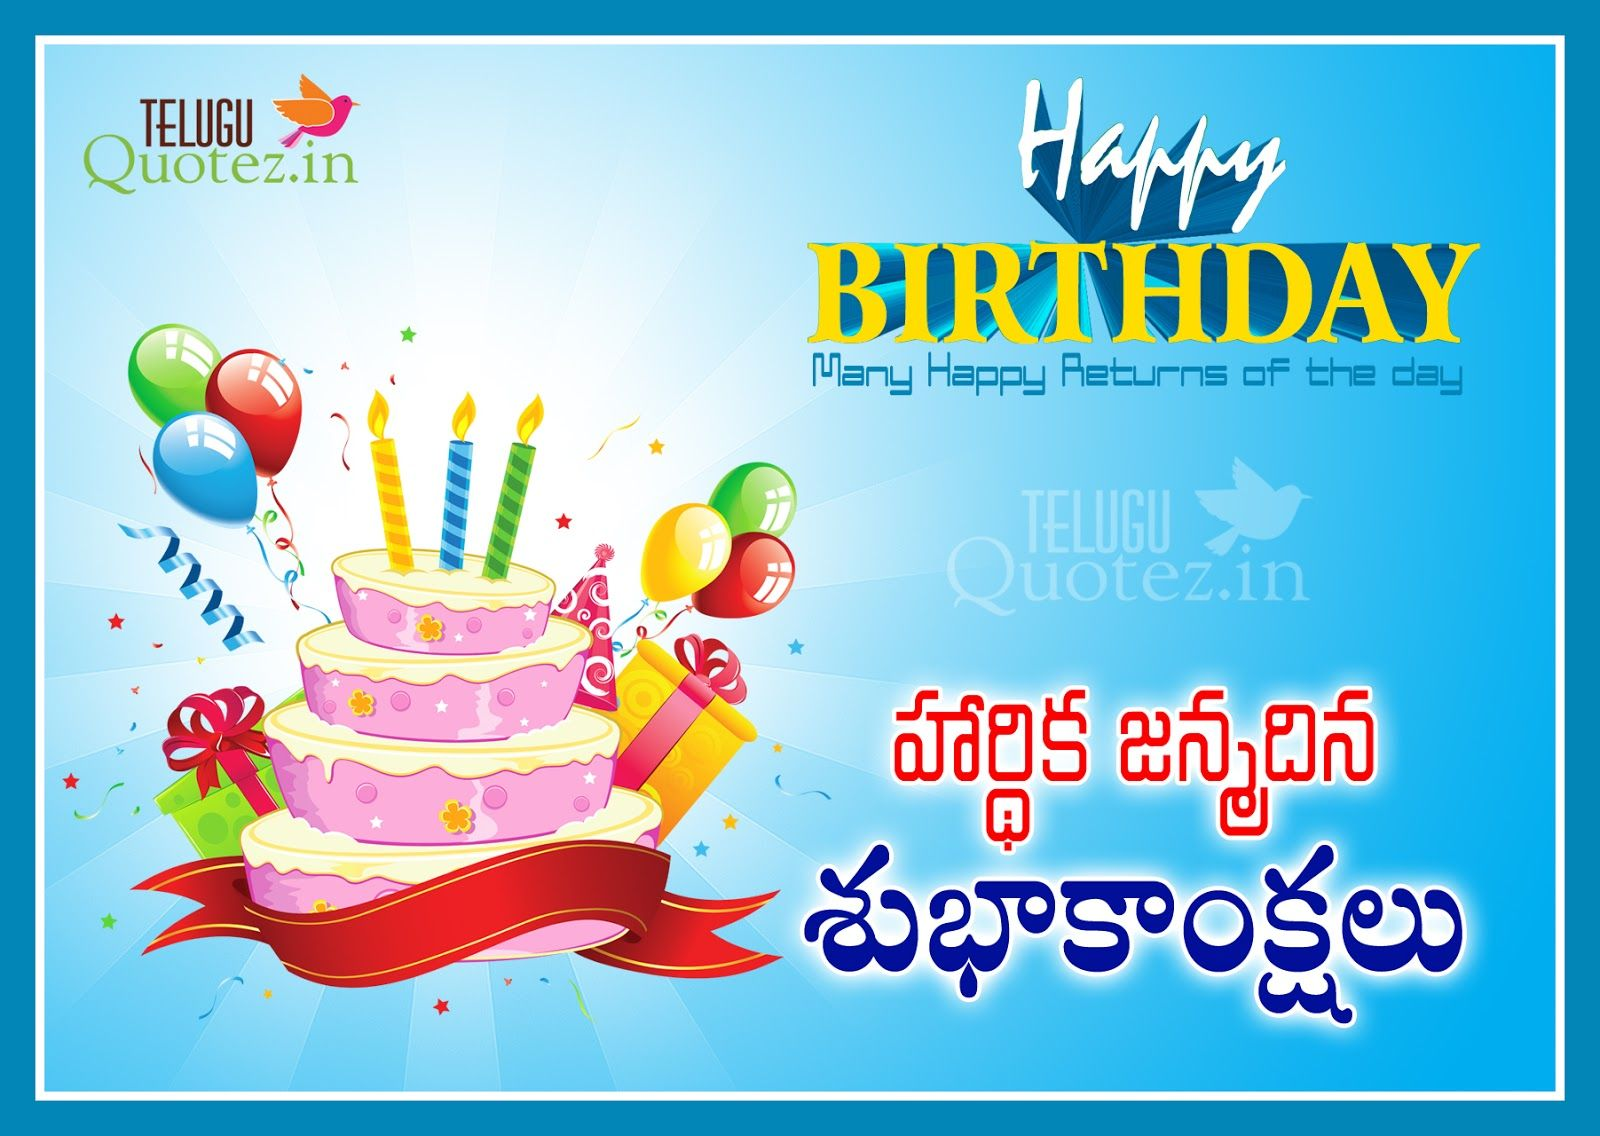 happy birthday telugu quotes wishes Teluguquotez.in